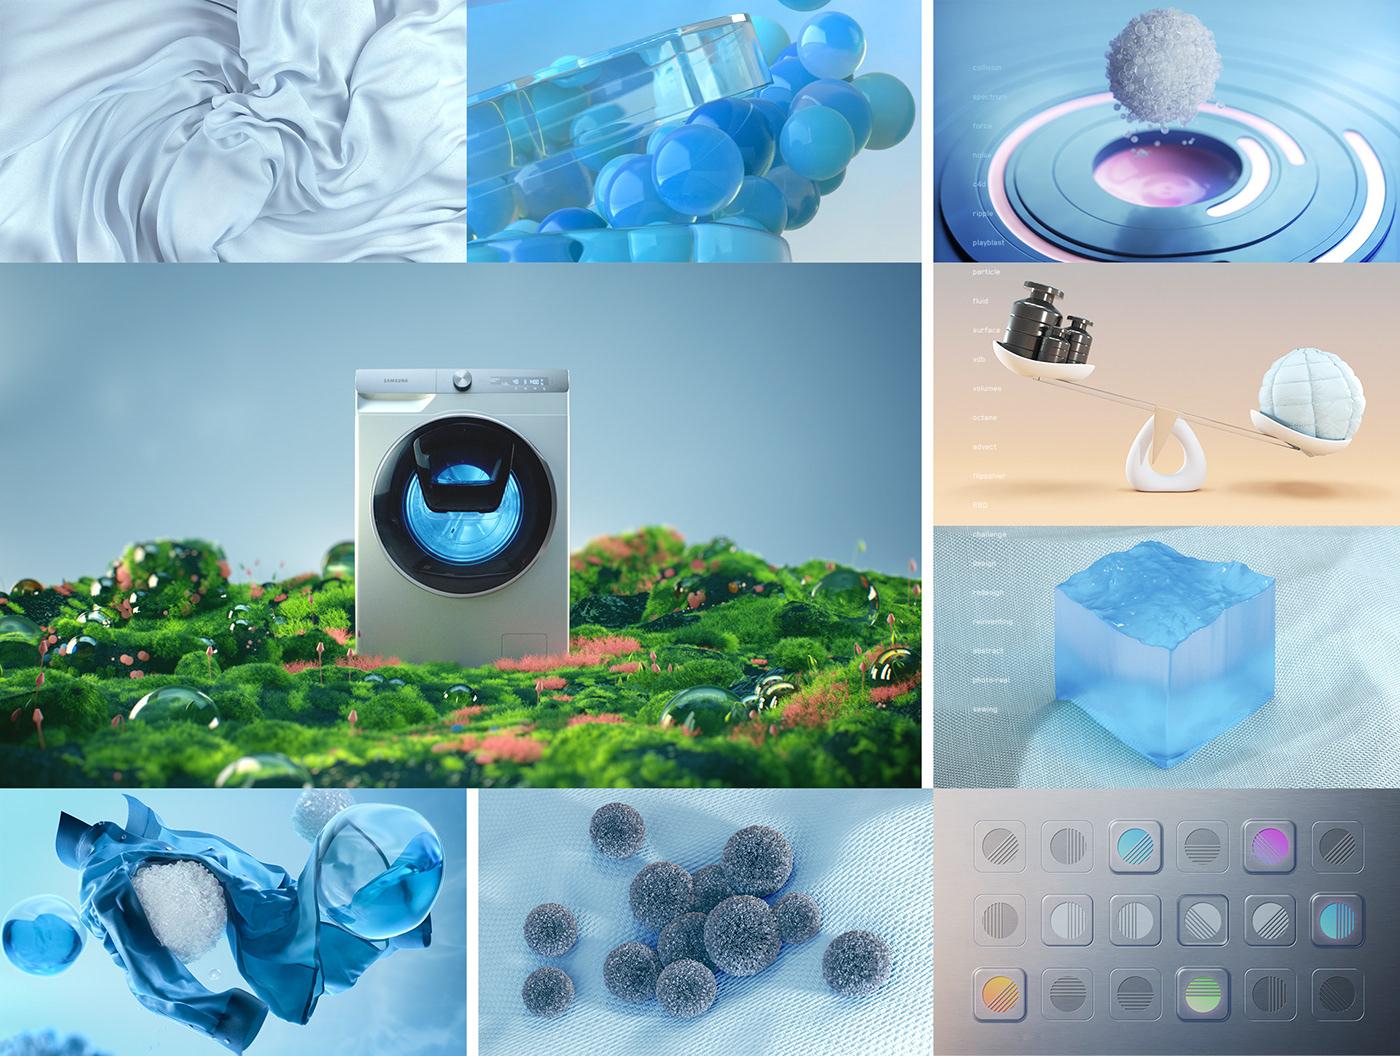 Still frames from Samsung Washing Machine animation